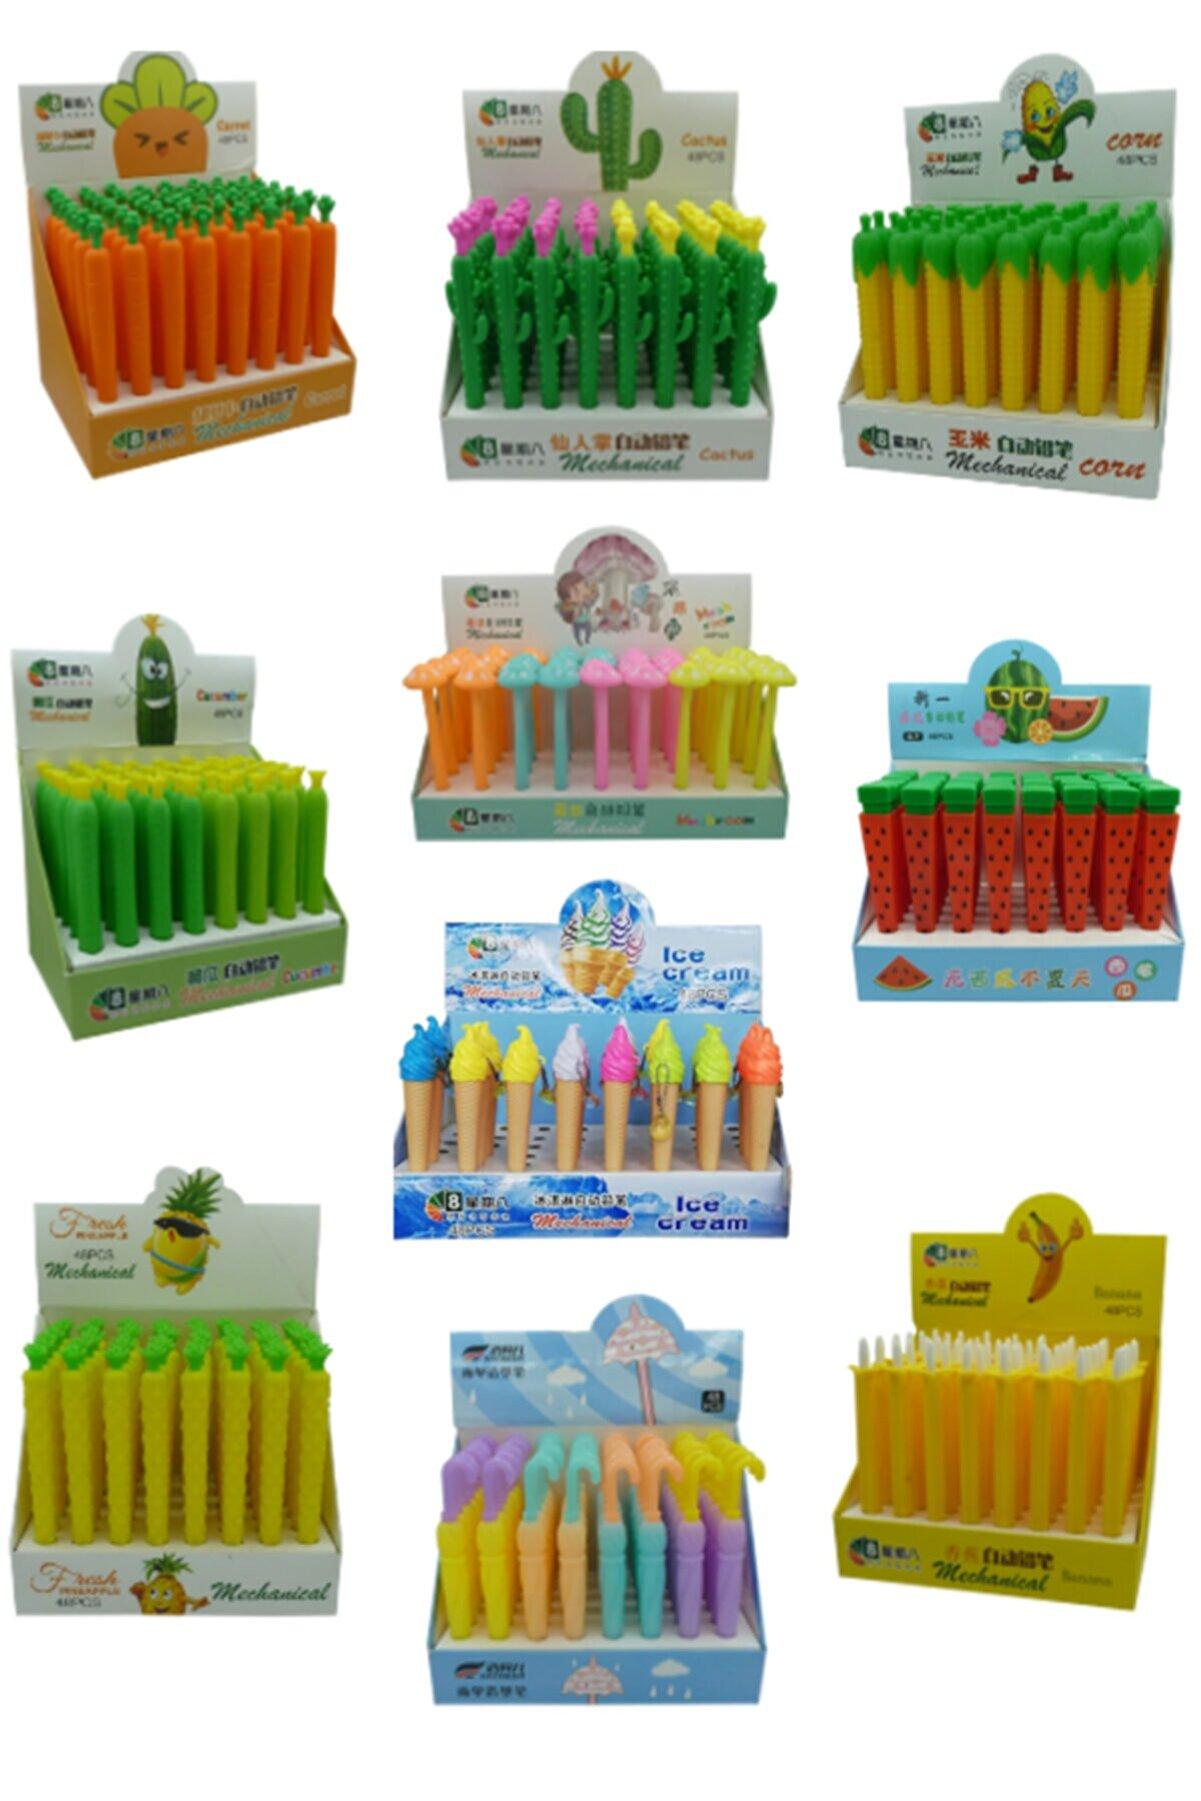 Kuki Buperom Eğlenceli Versatil Kalemler 10 Adet Toplam